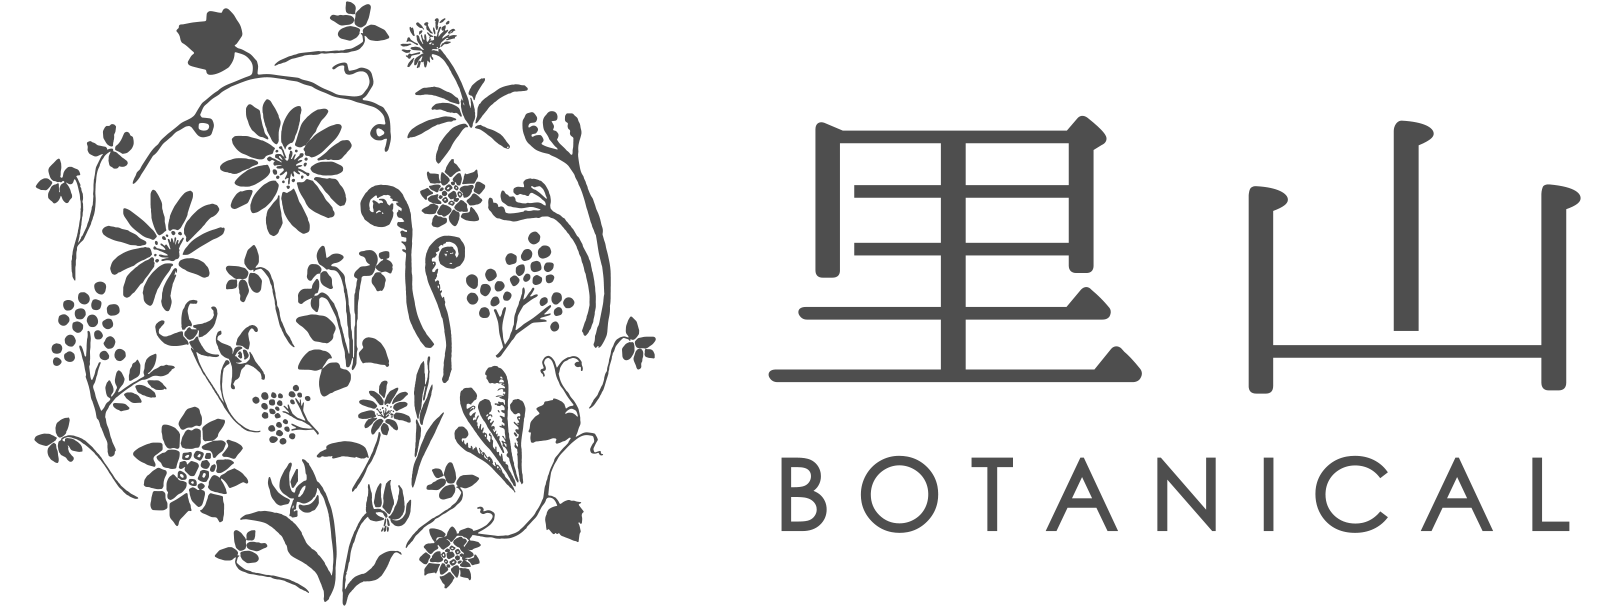 里山BOTANICAL